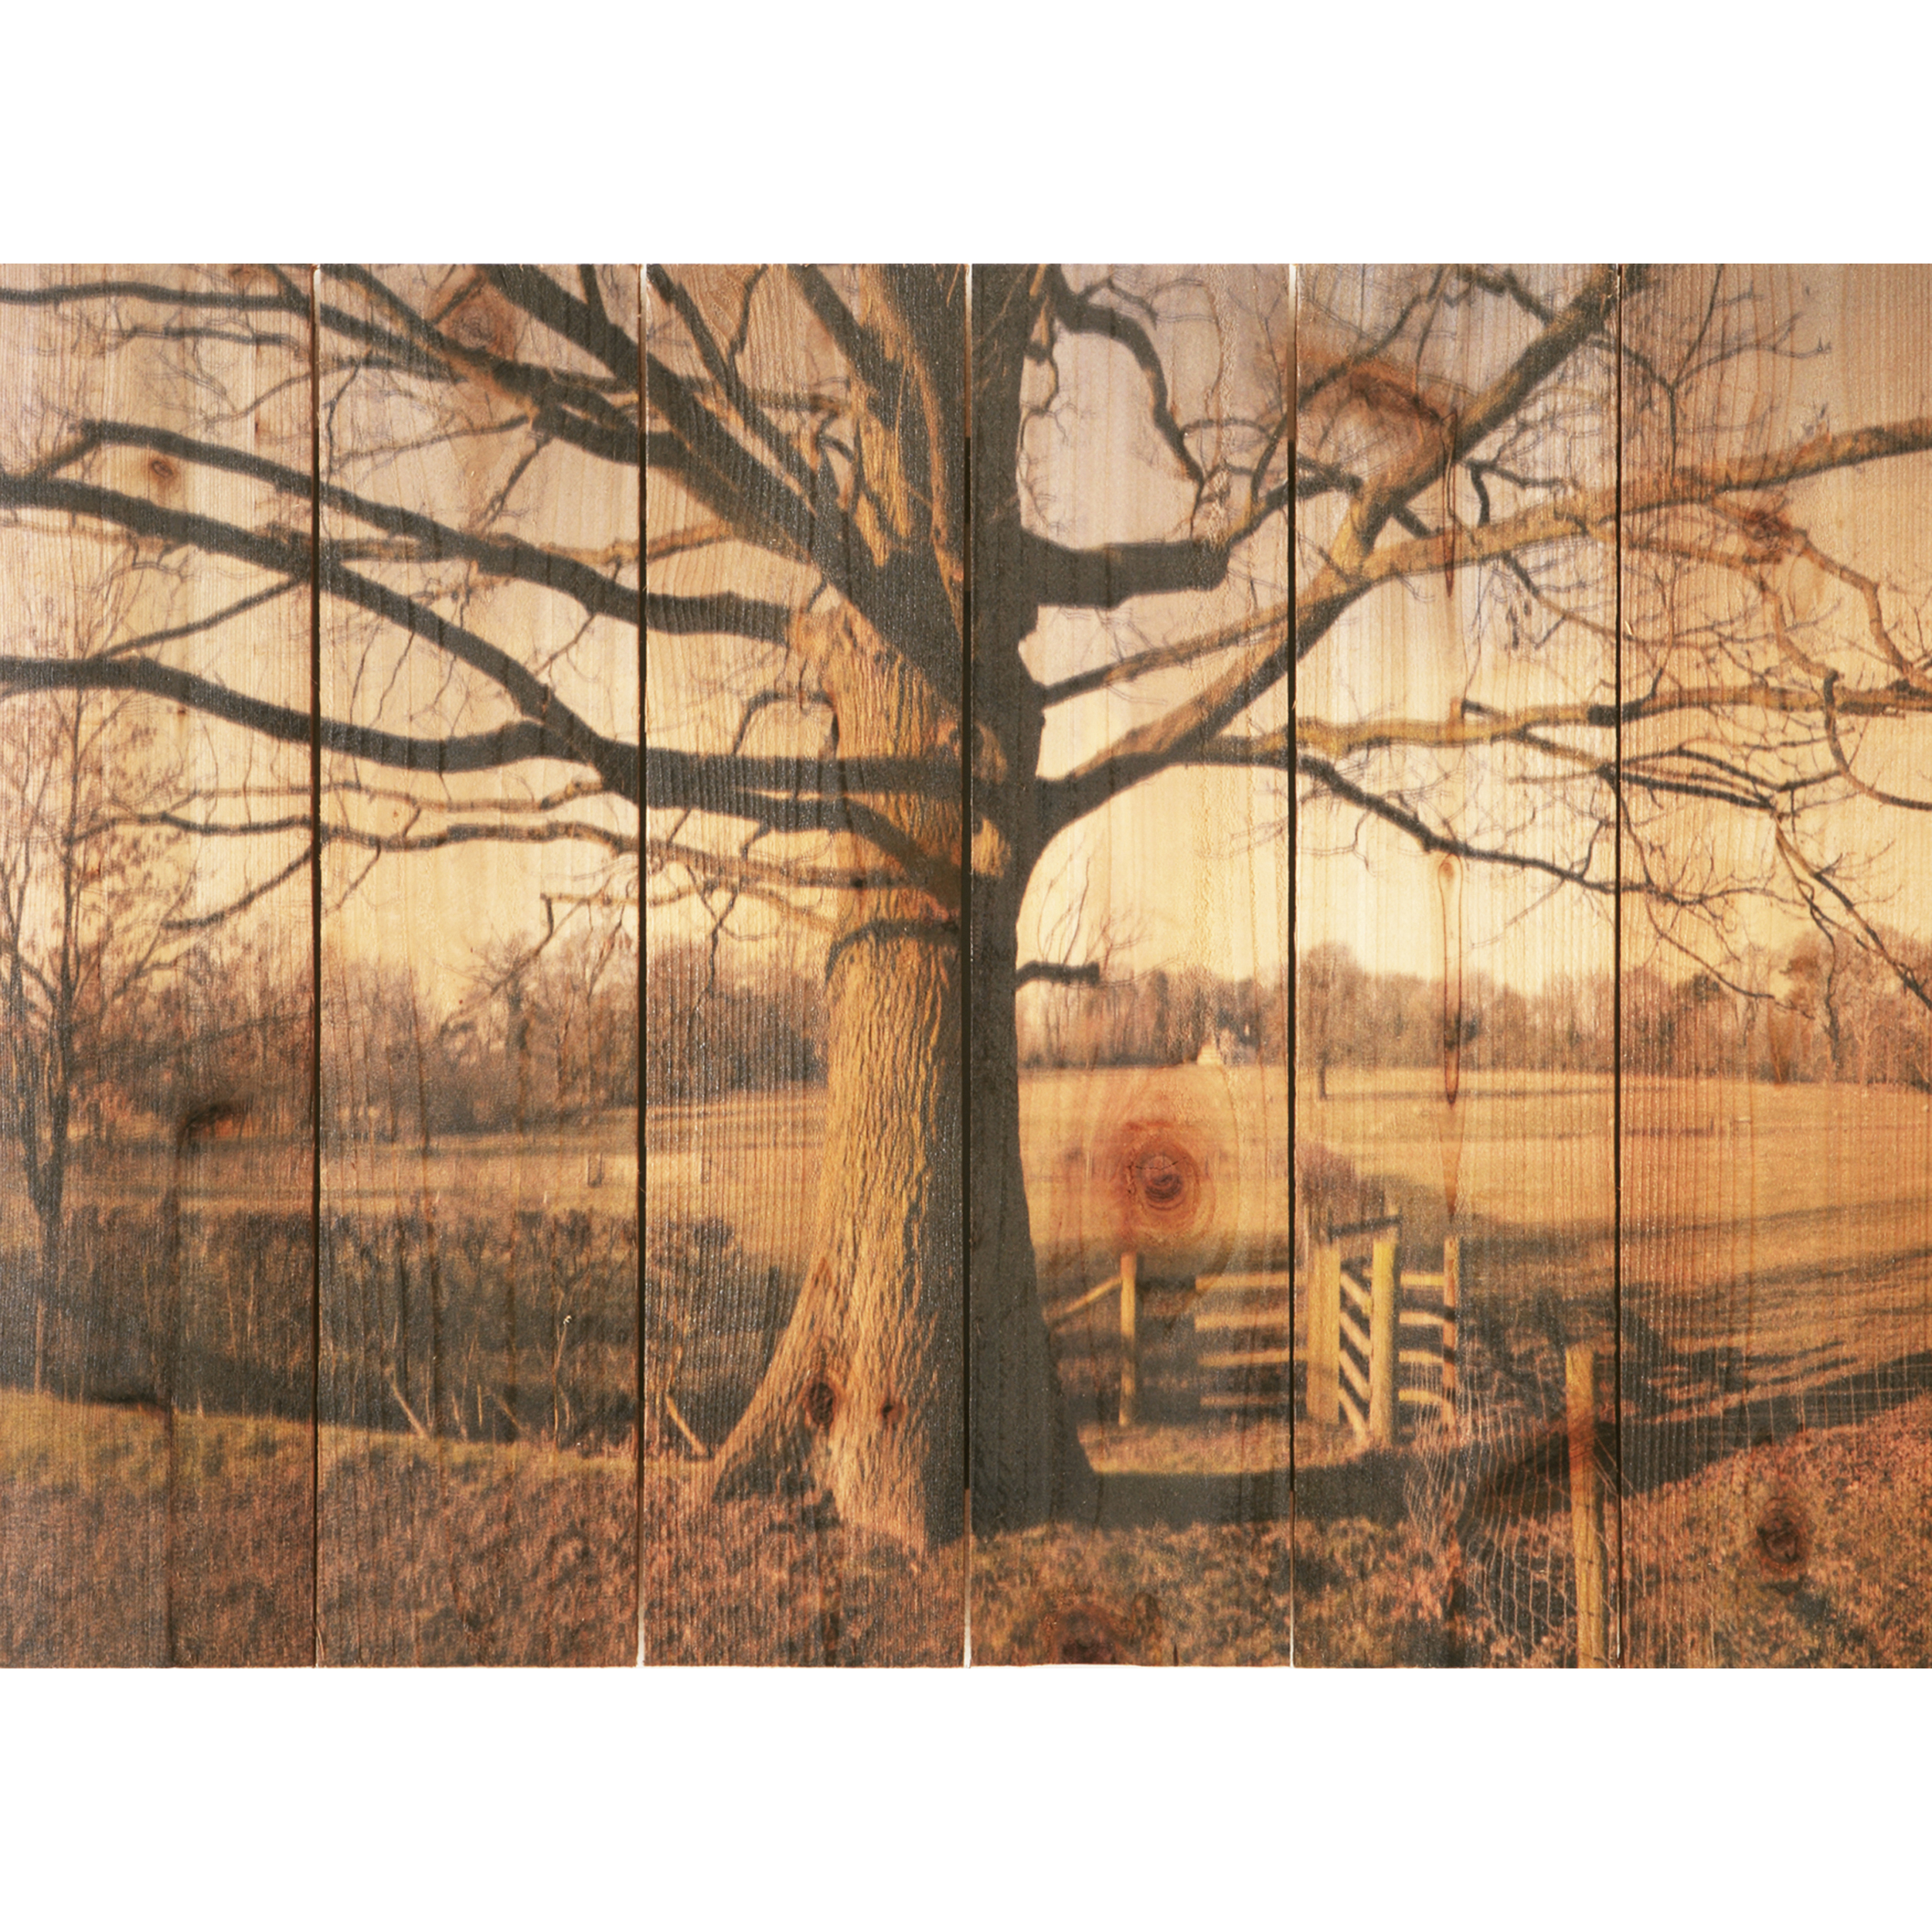 Daydream Gizaun Cedar Wall Art, Big Oak, 33